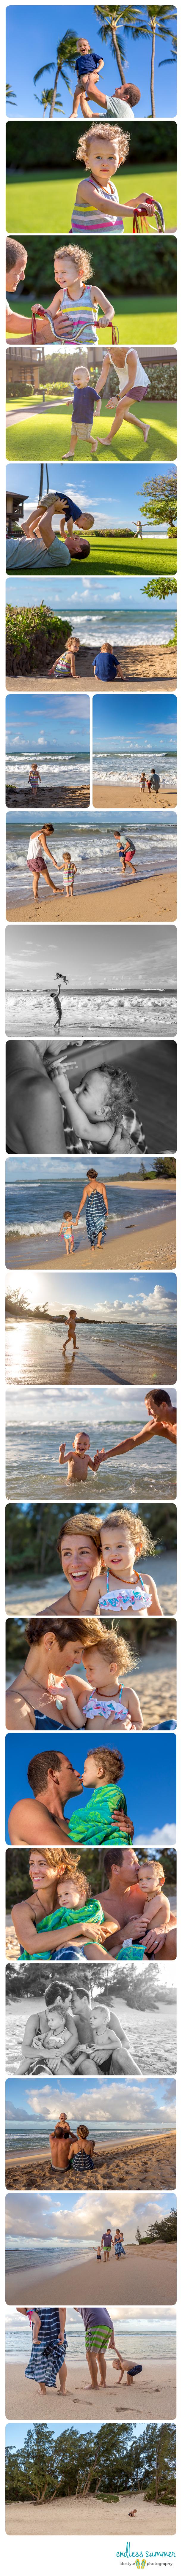 Maui Beach Family Photography